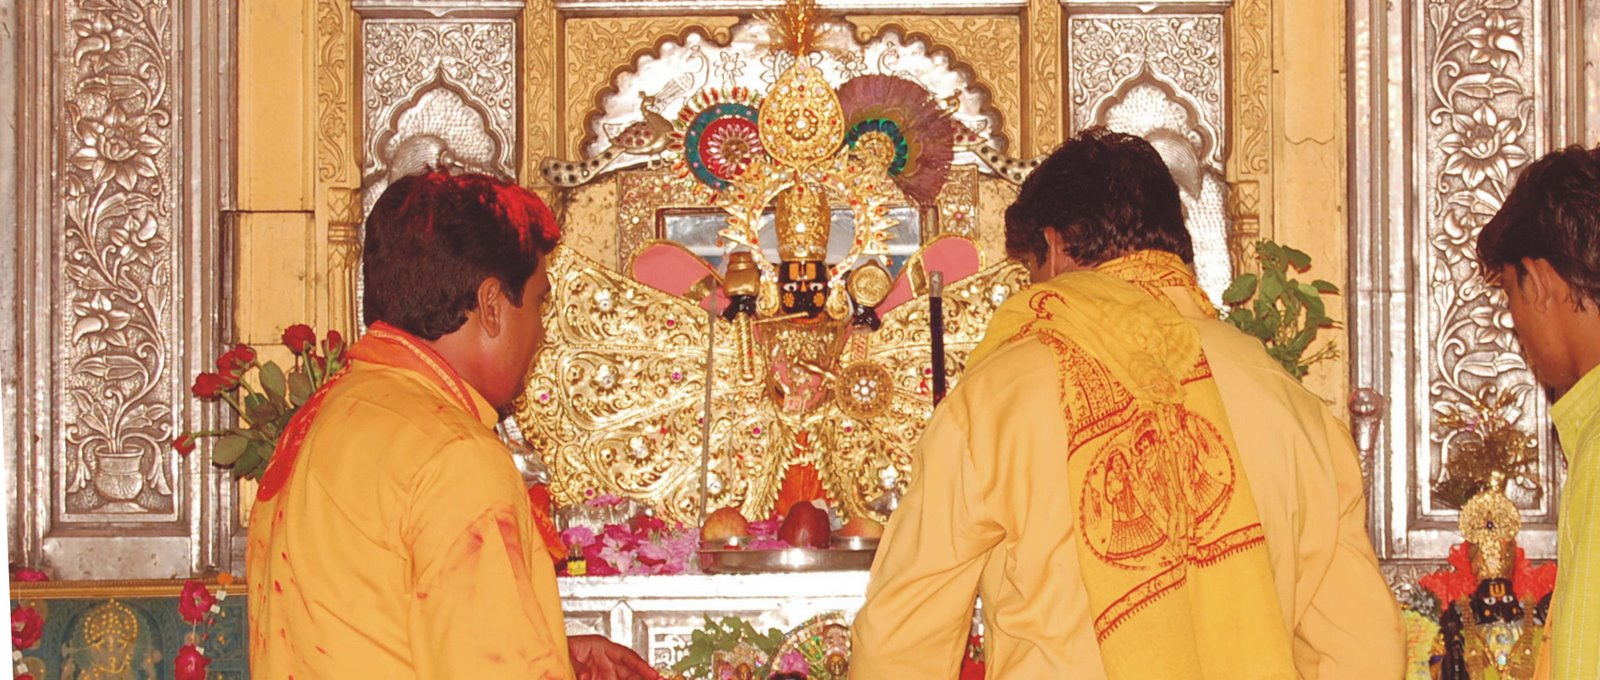 Information About Shri Sanwariya Seth Of Chittorgarh In Rajasthan